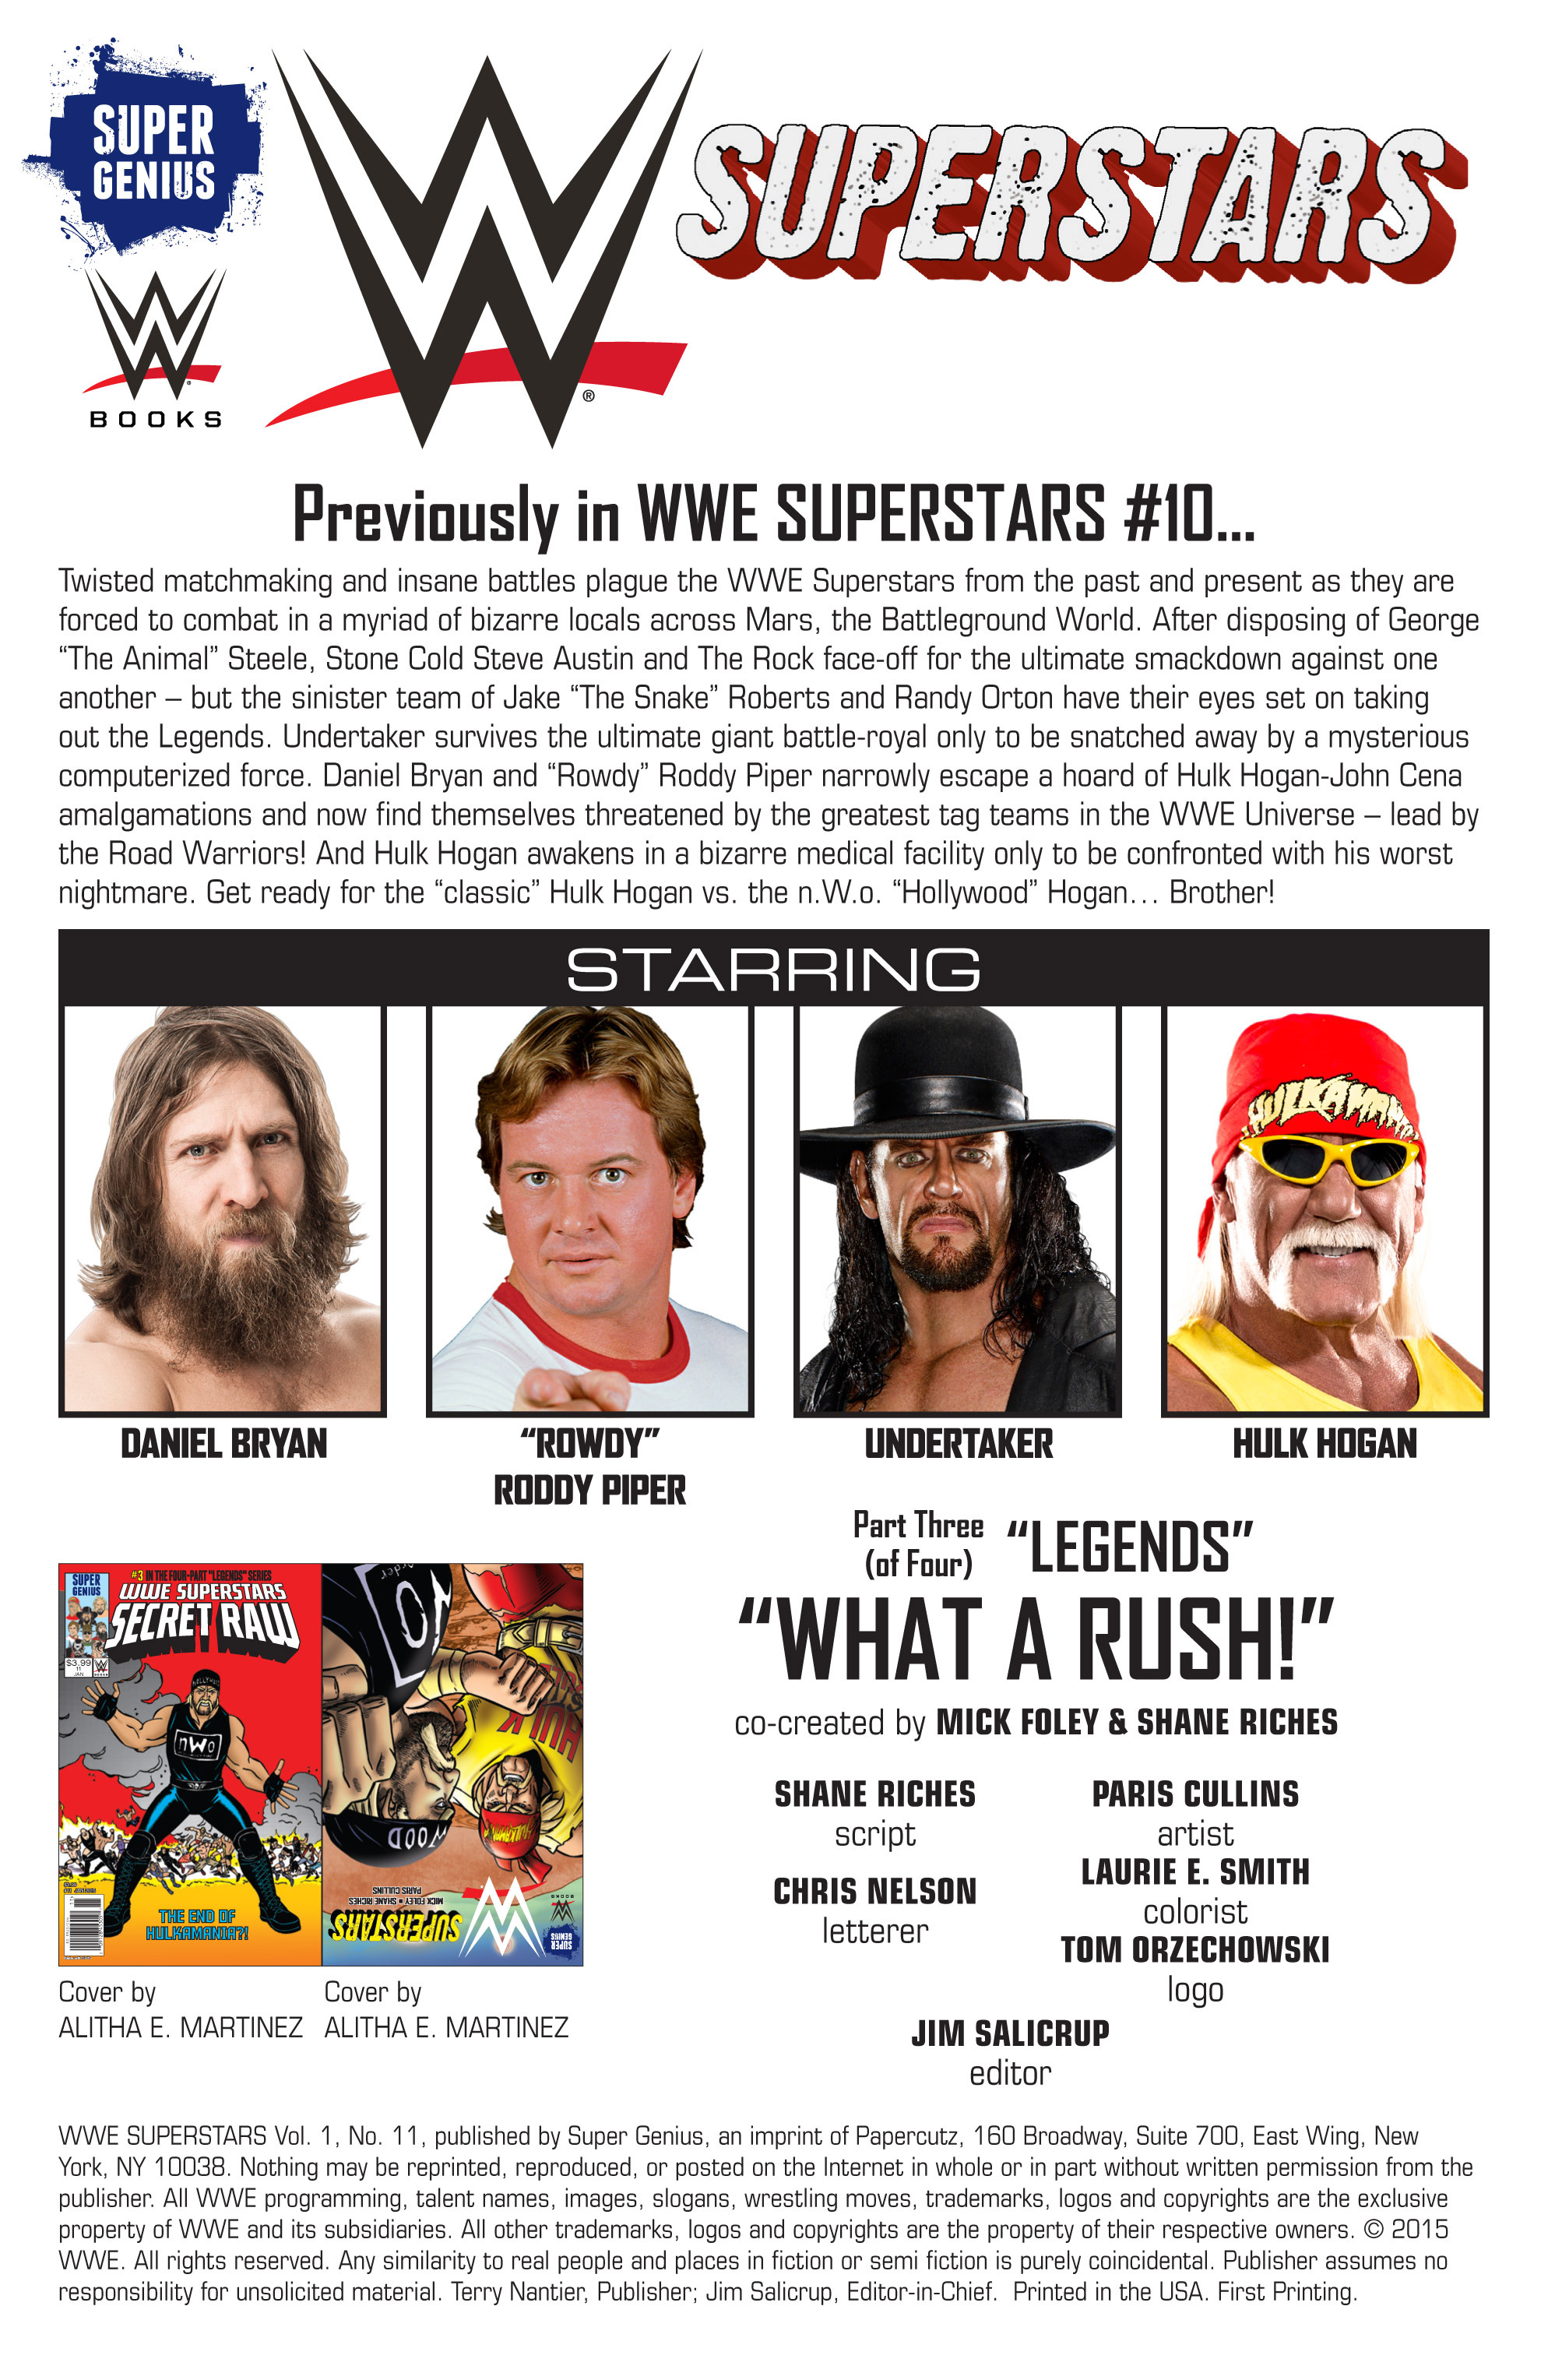 Read online WWE Superstars comic -  Issue #11 - 3